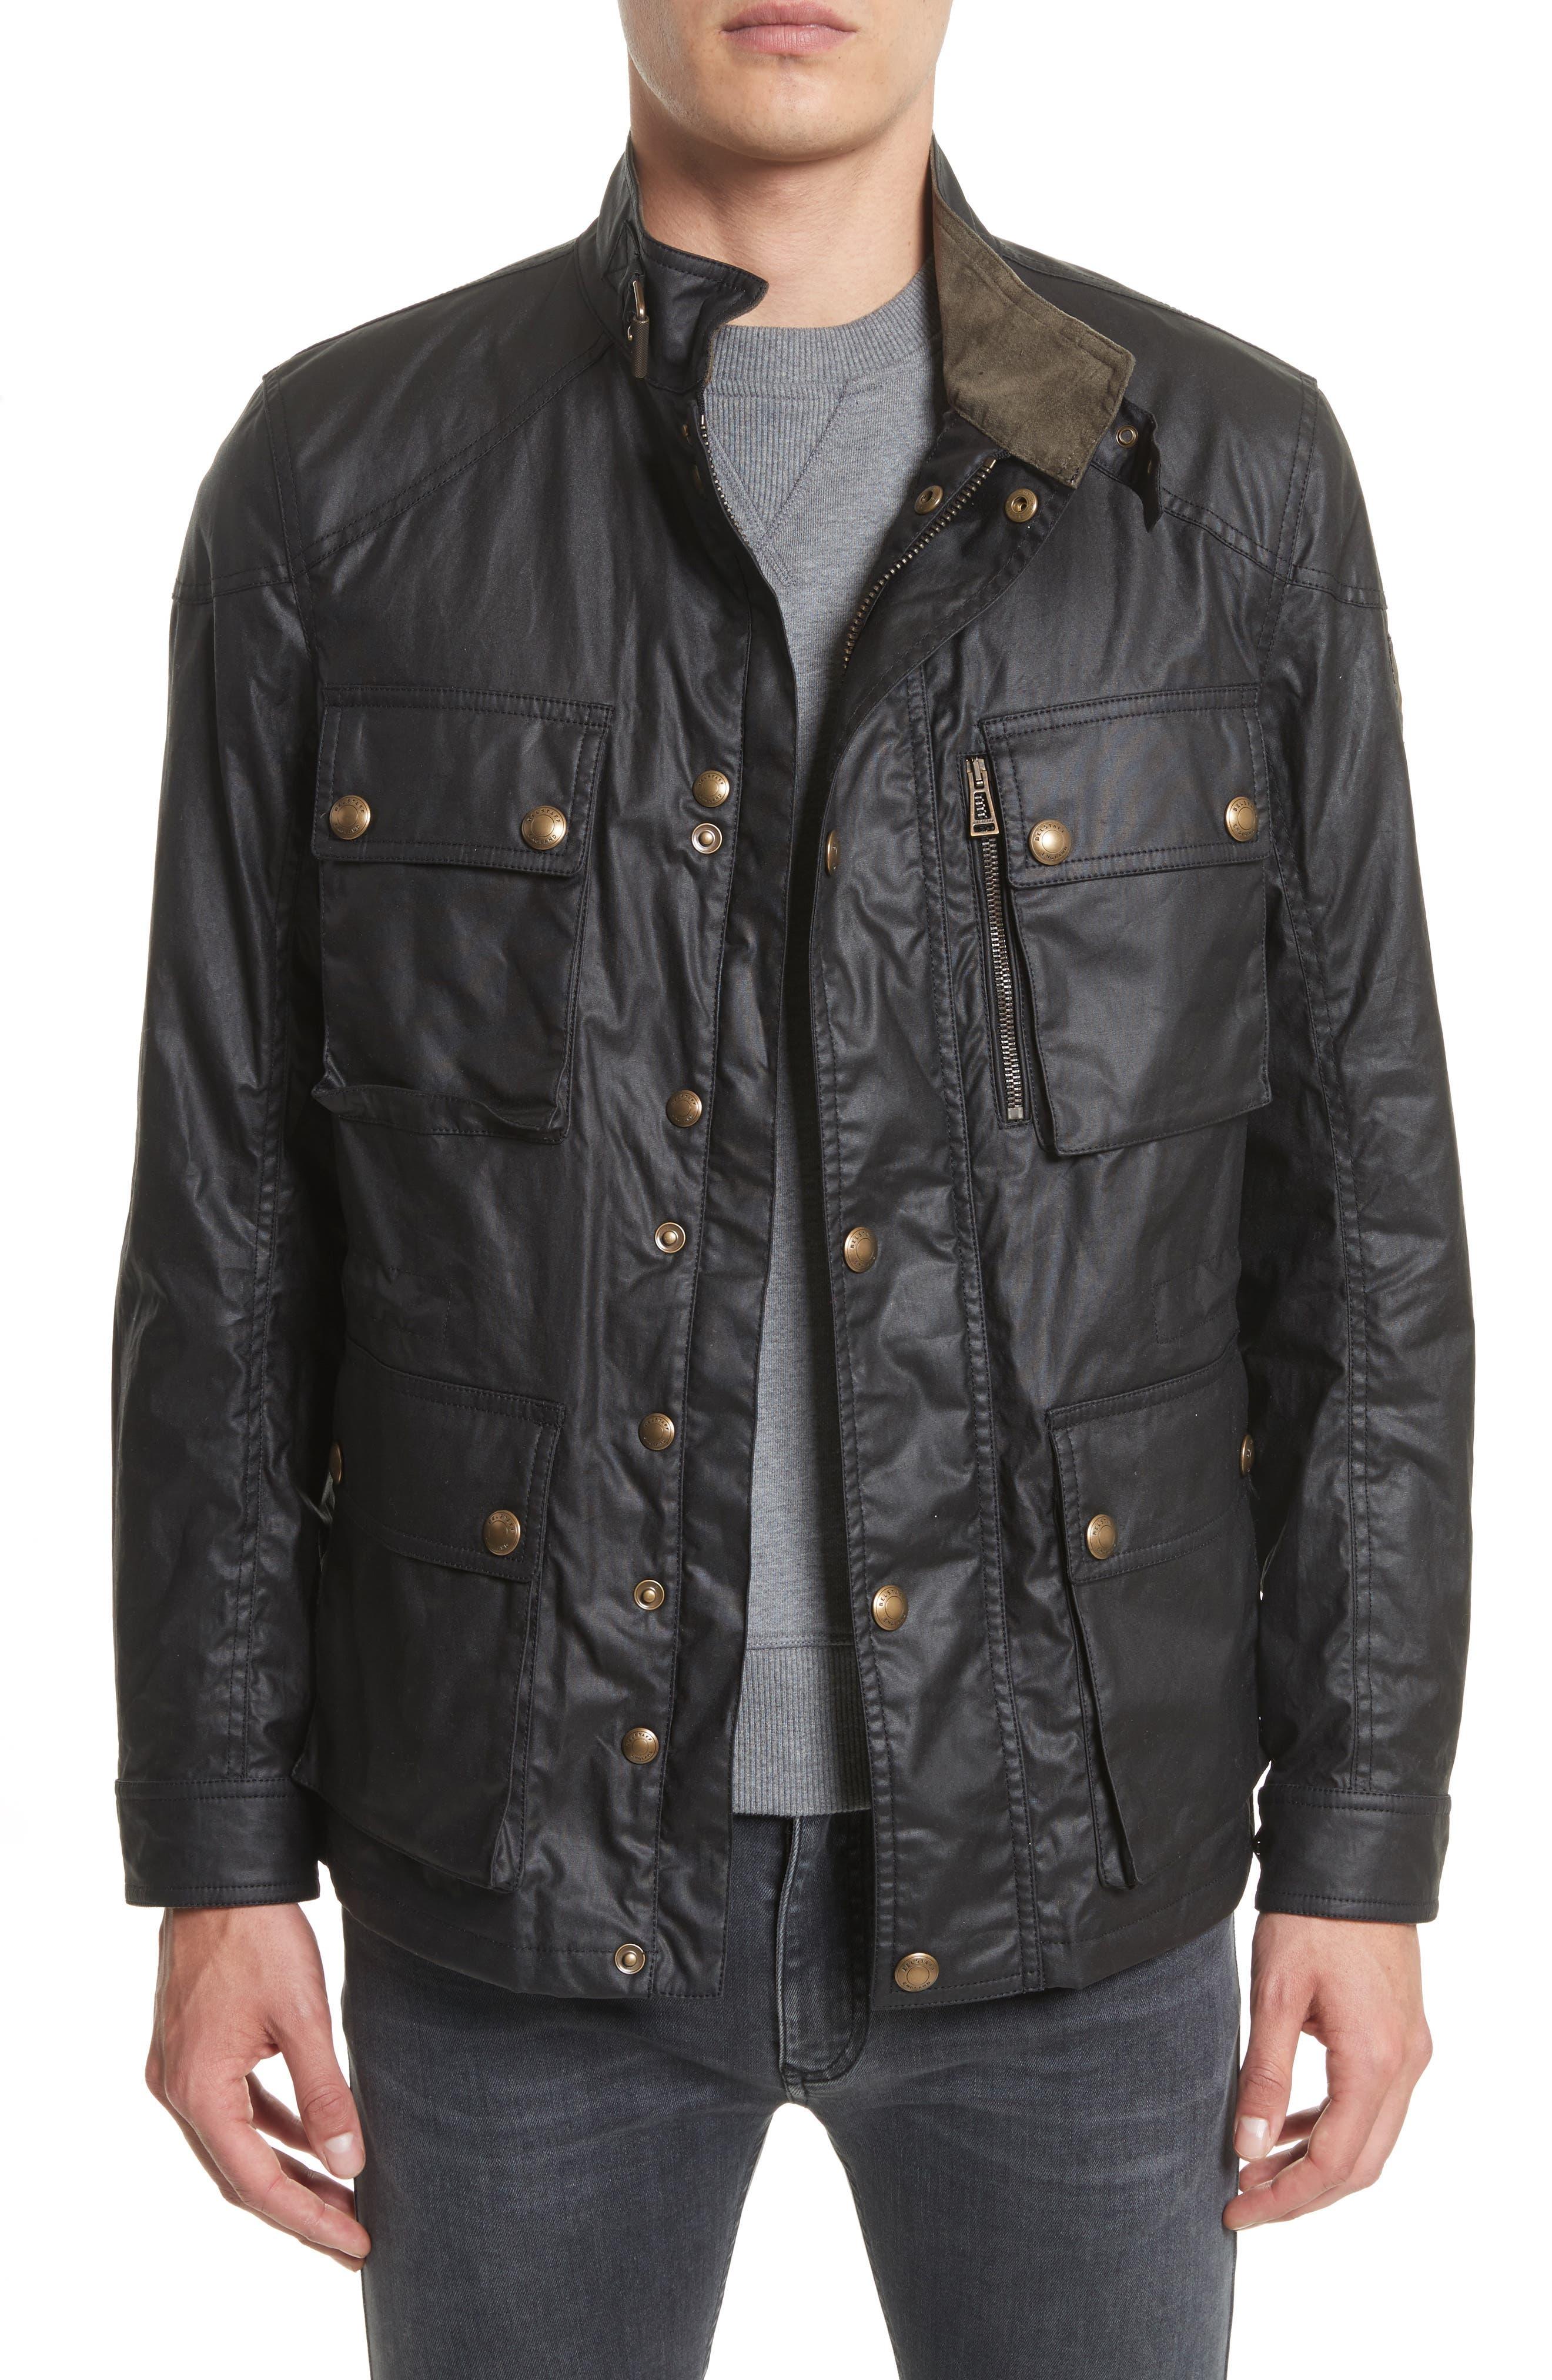 Belstaff 'Trialmaster 2015' Waxed Cotton Jacket